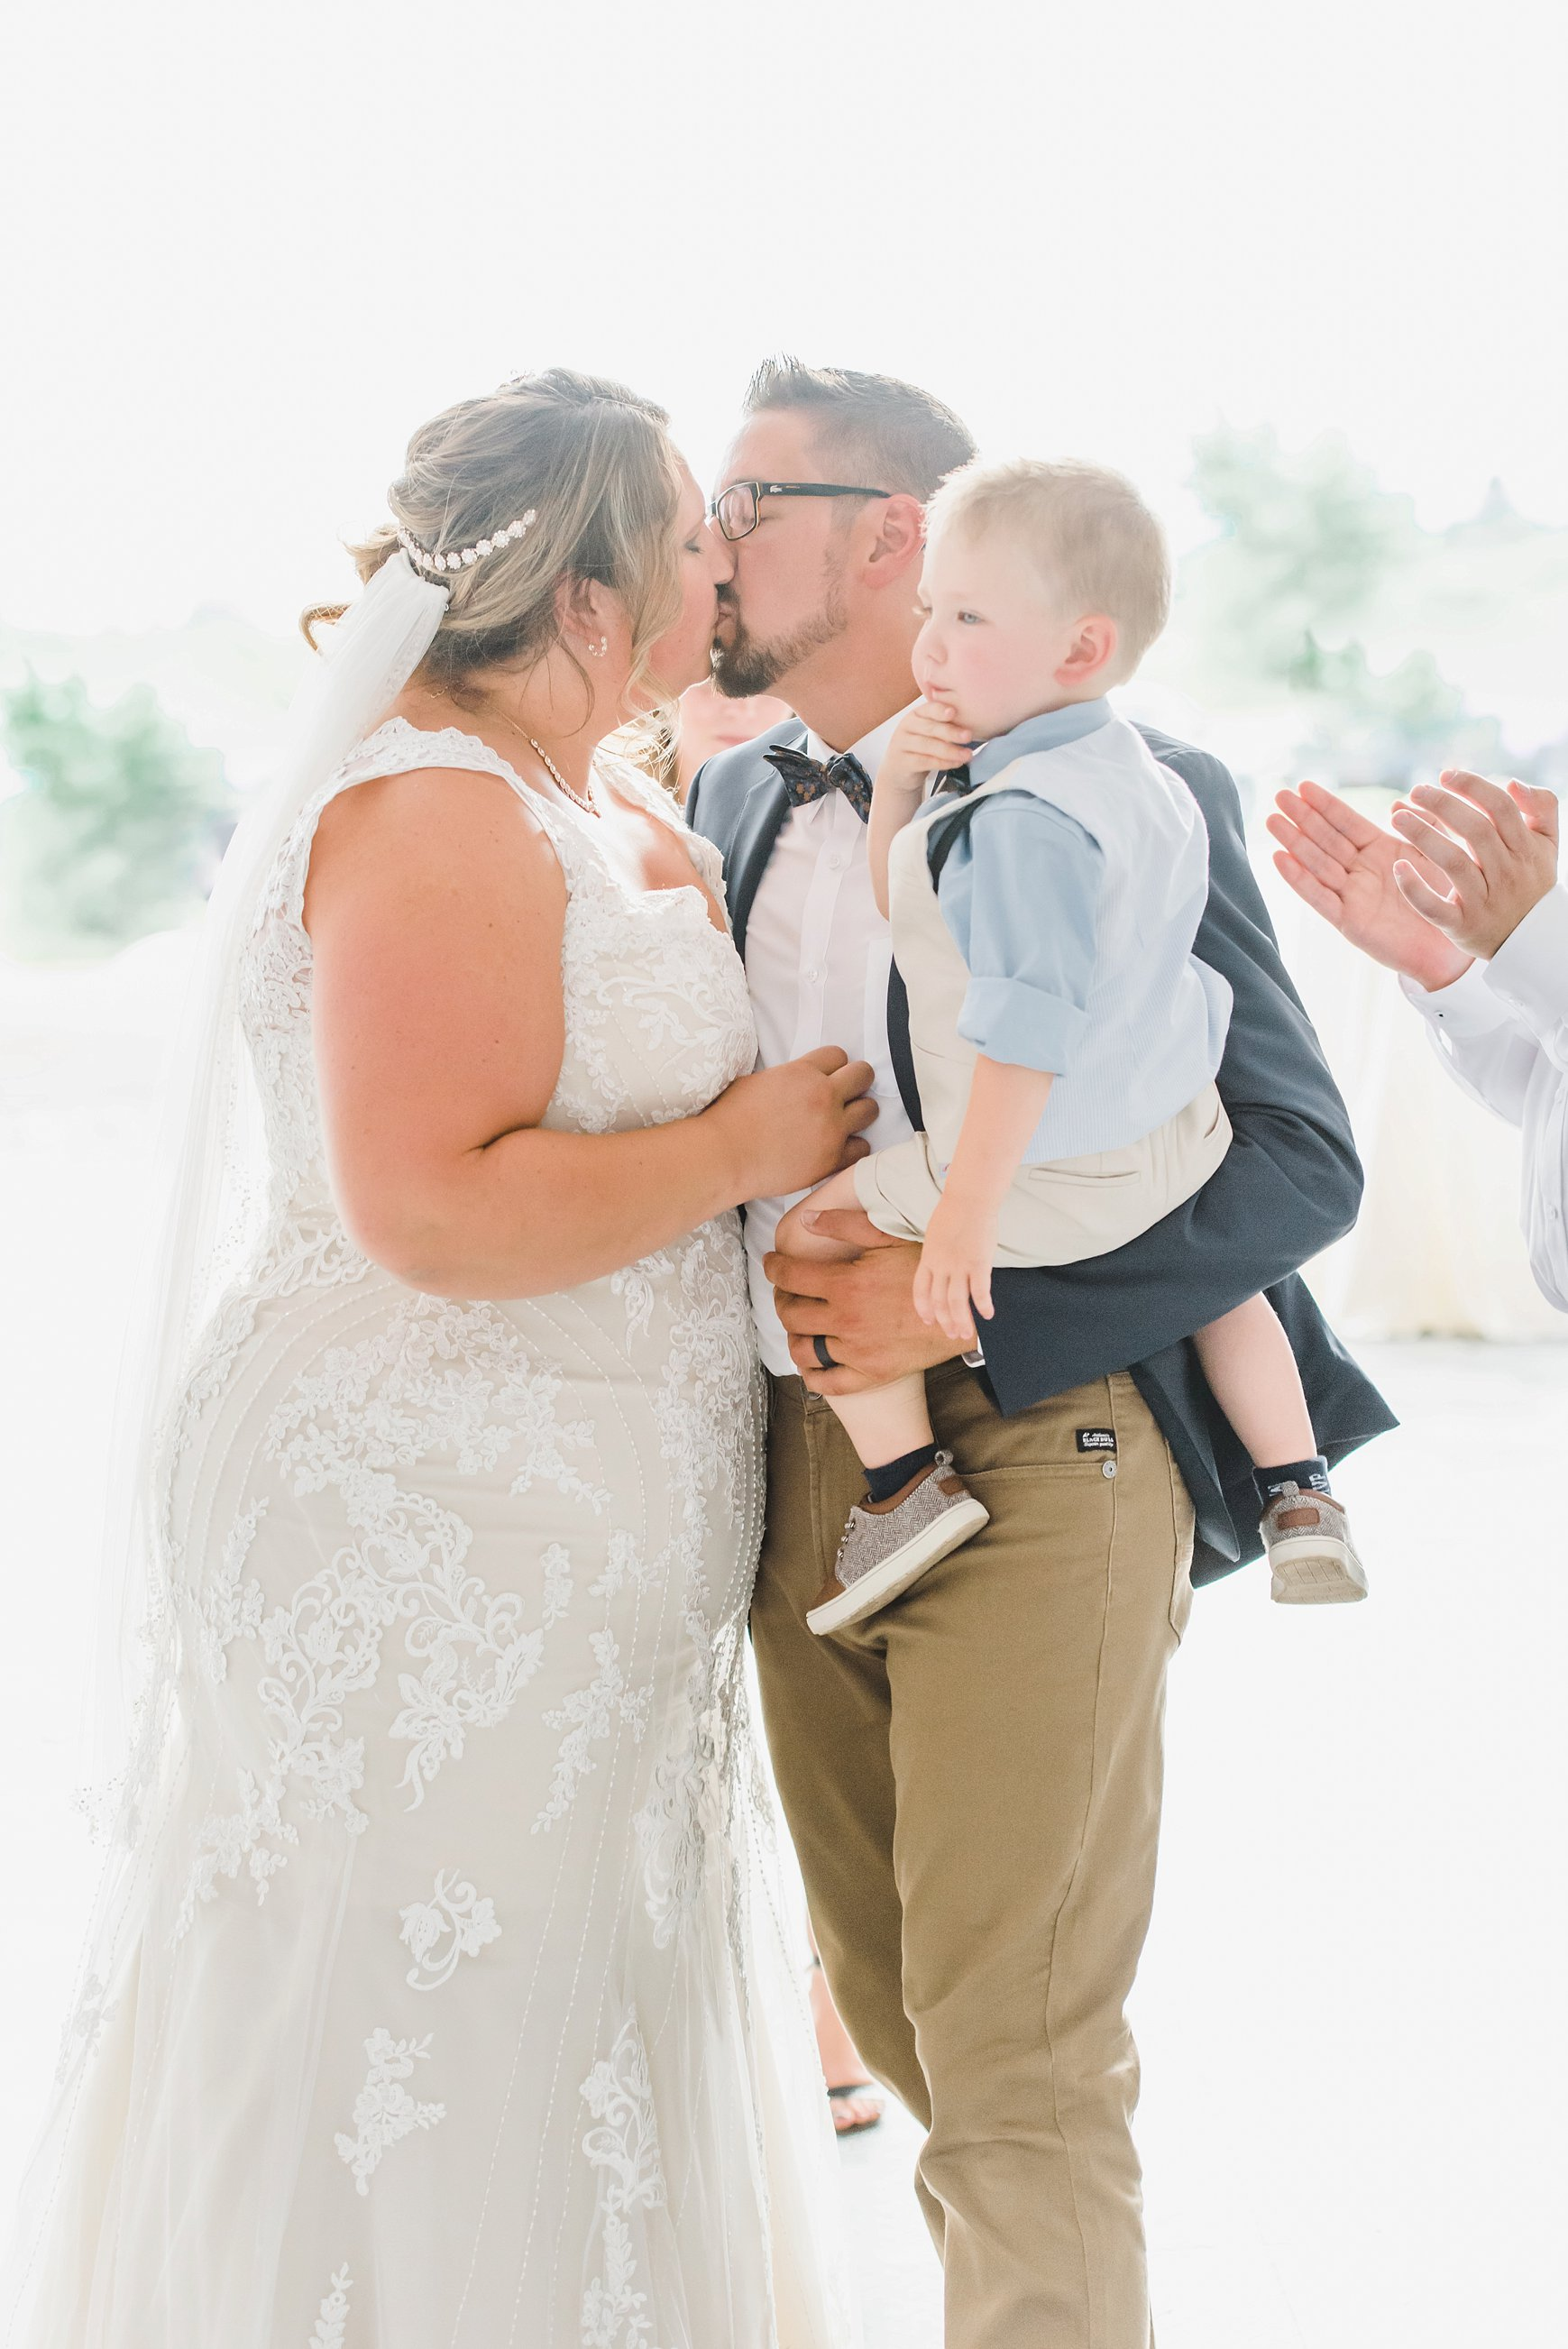 light airy indie fine art ottawa wedding photographer | Ali and Batoul Photography_0371.jpg